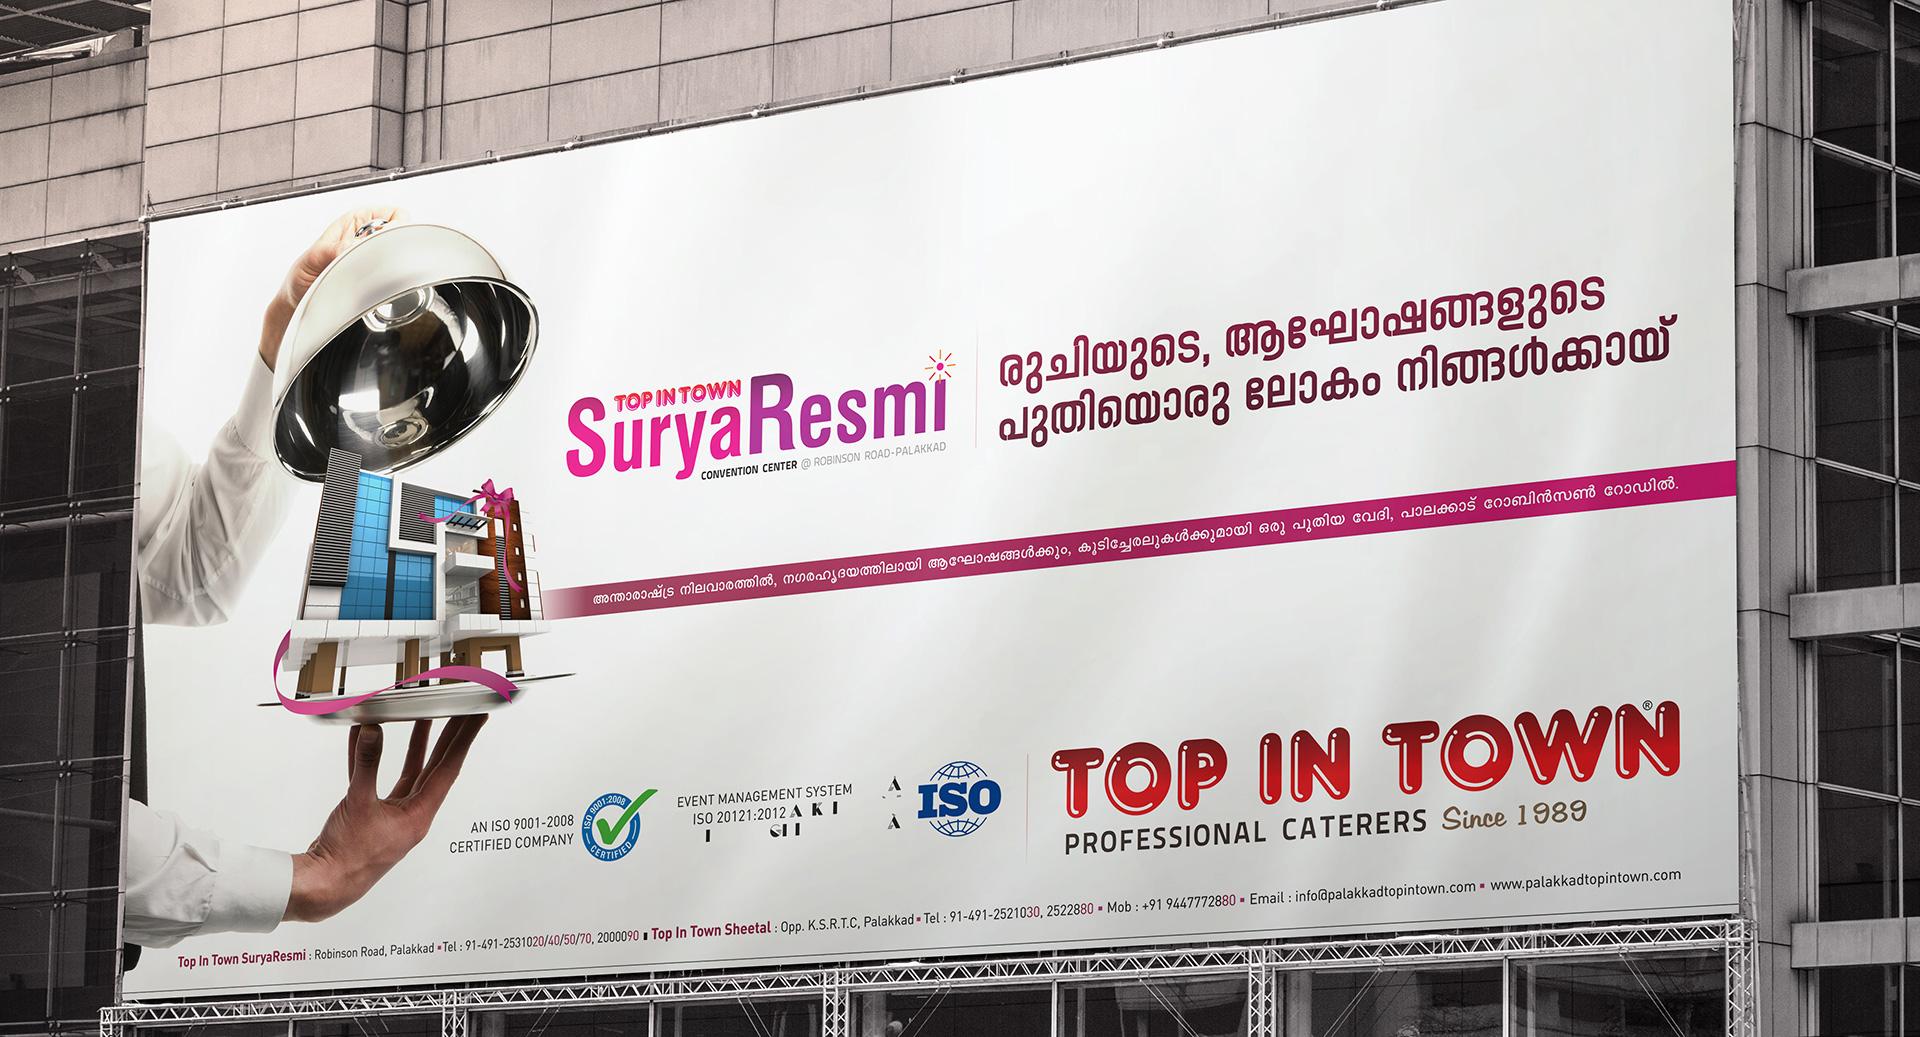 Billboard of Top in Town Surya Resmi Convention centre